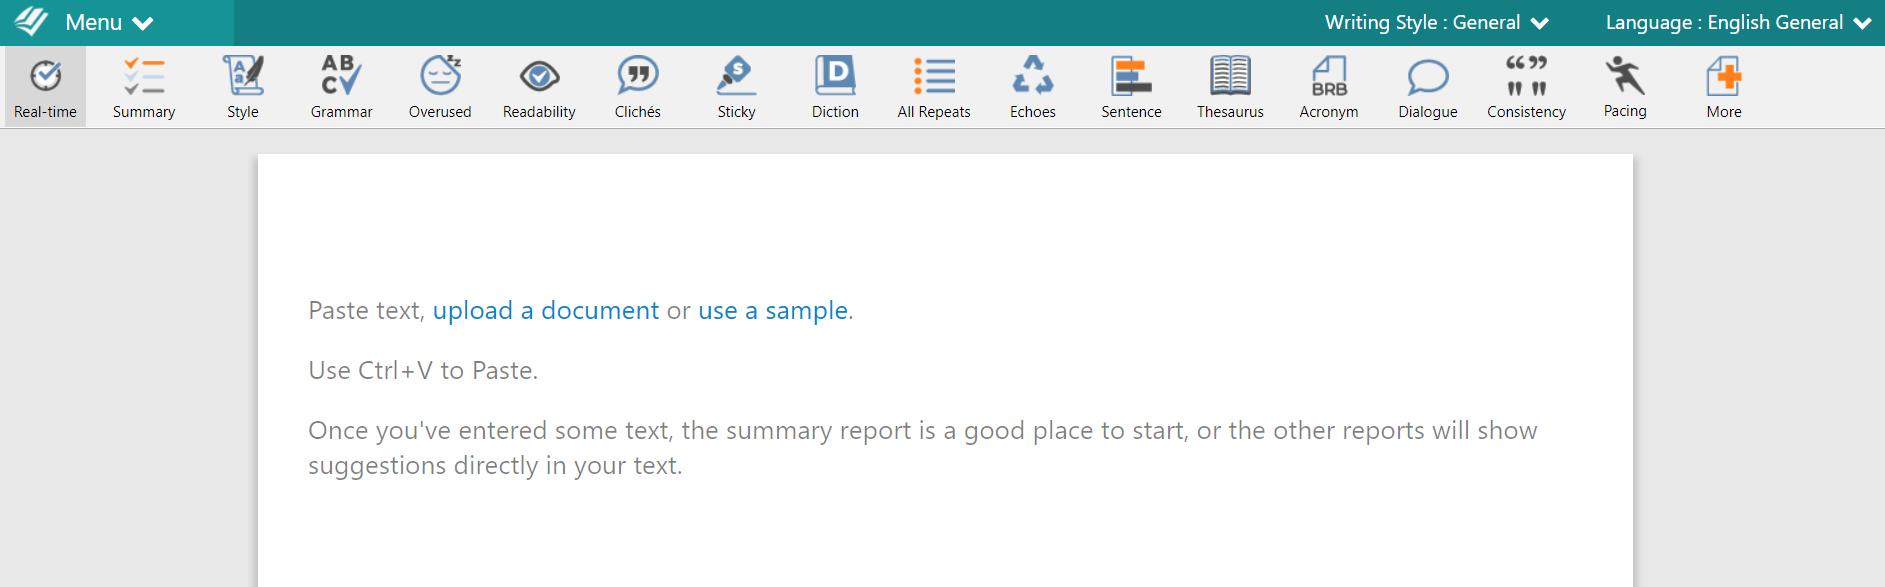 ProWritingAid Text Editor example